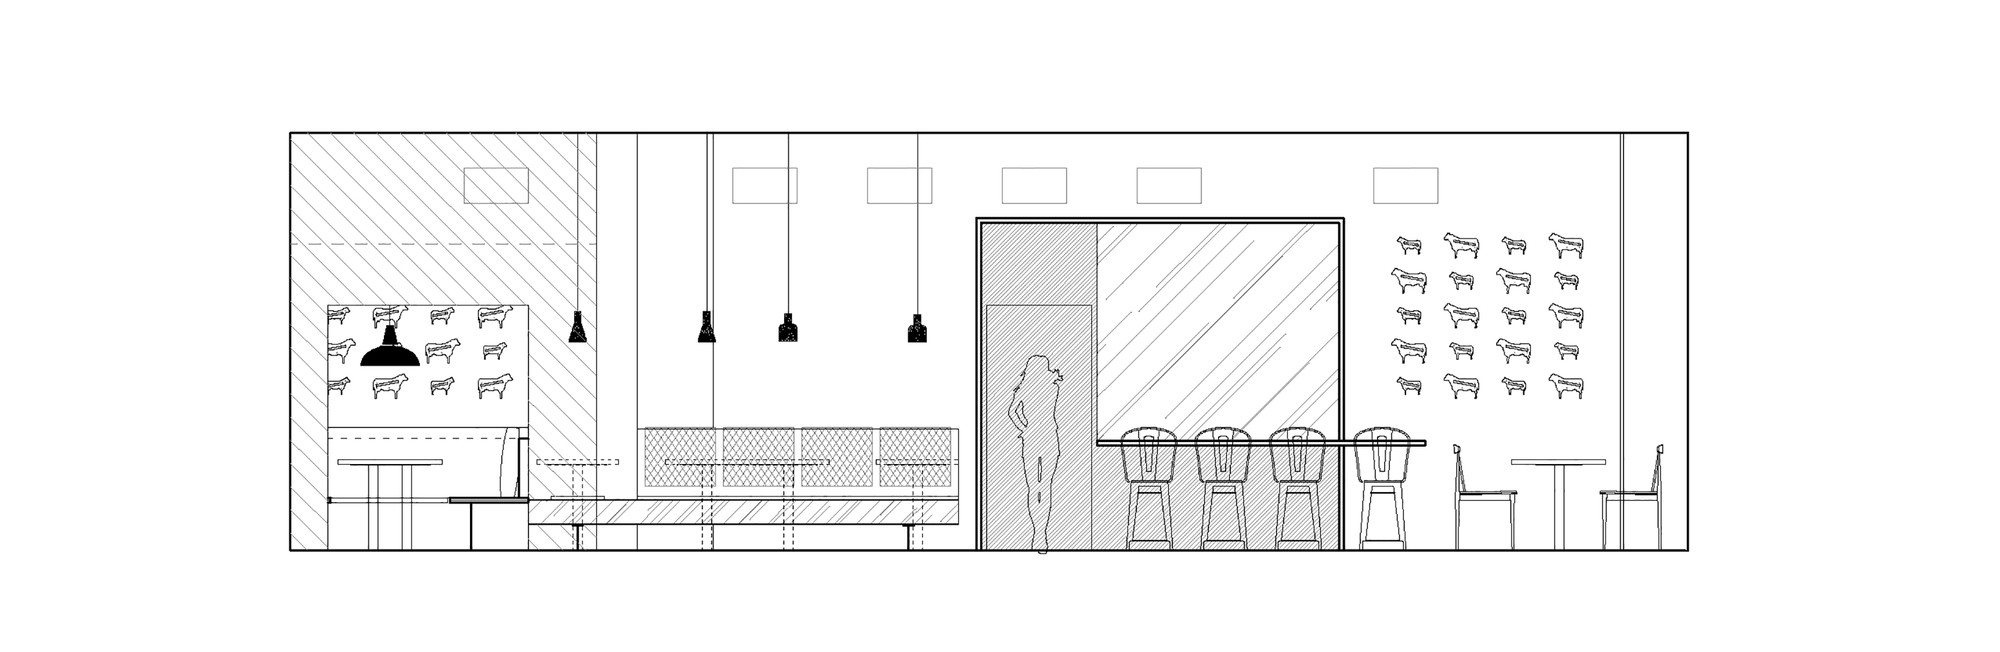 Pin office interior elevations on pinterest